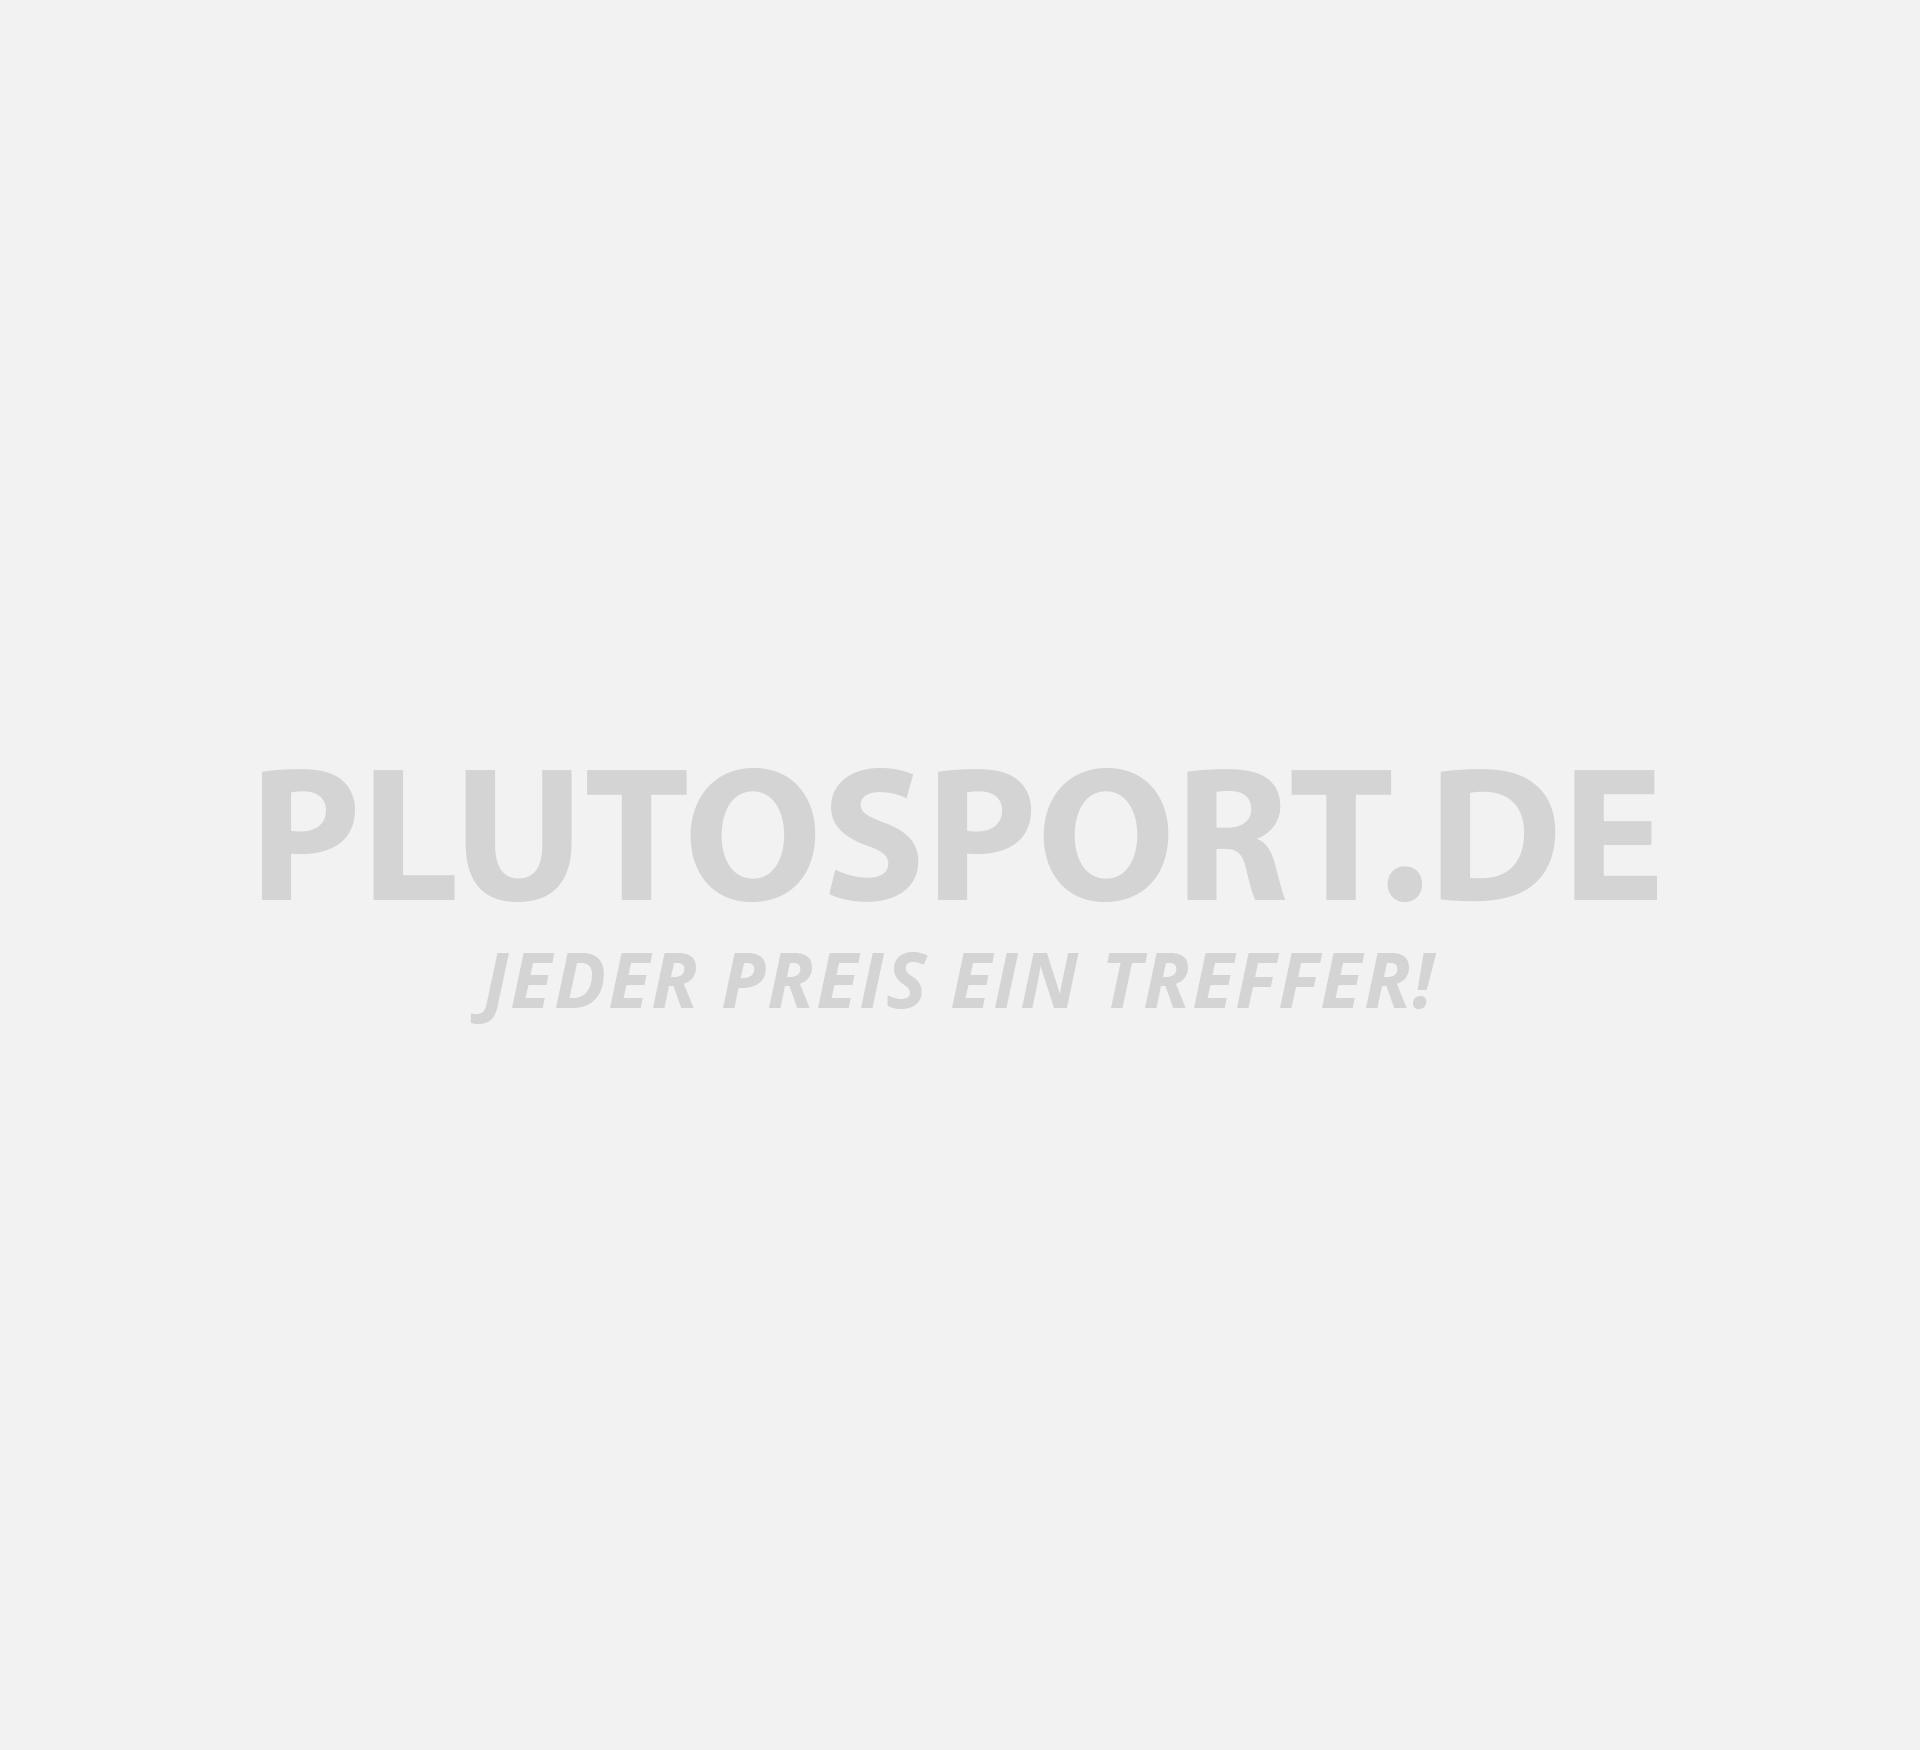 Nike Sport Handtuch Large Fitnessaccessoires Fitnessausrüstung